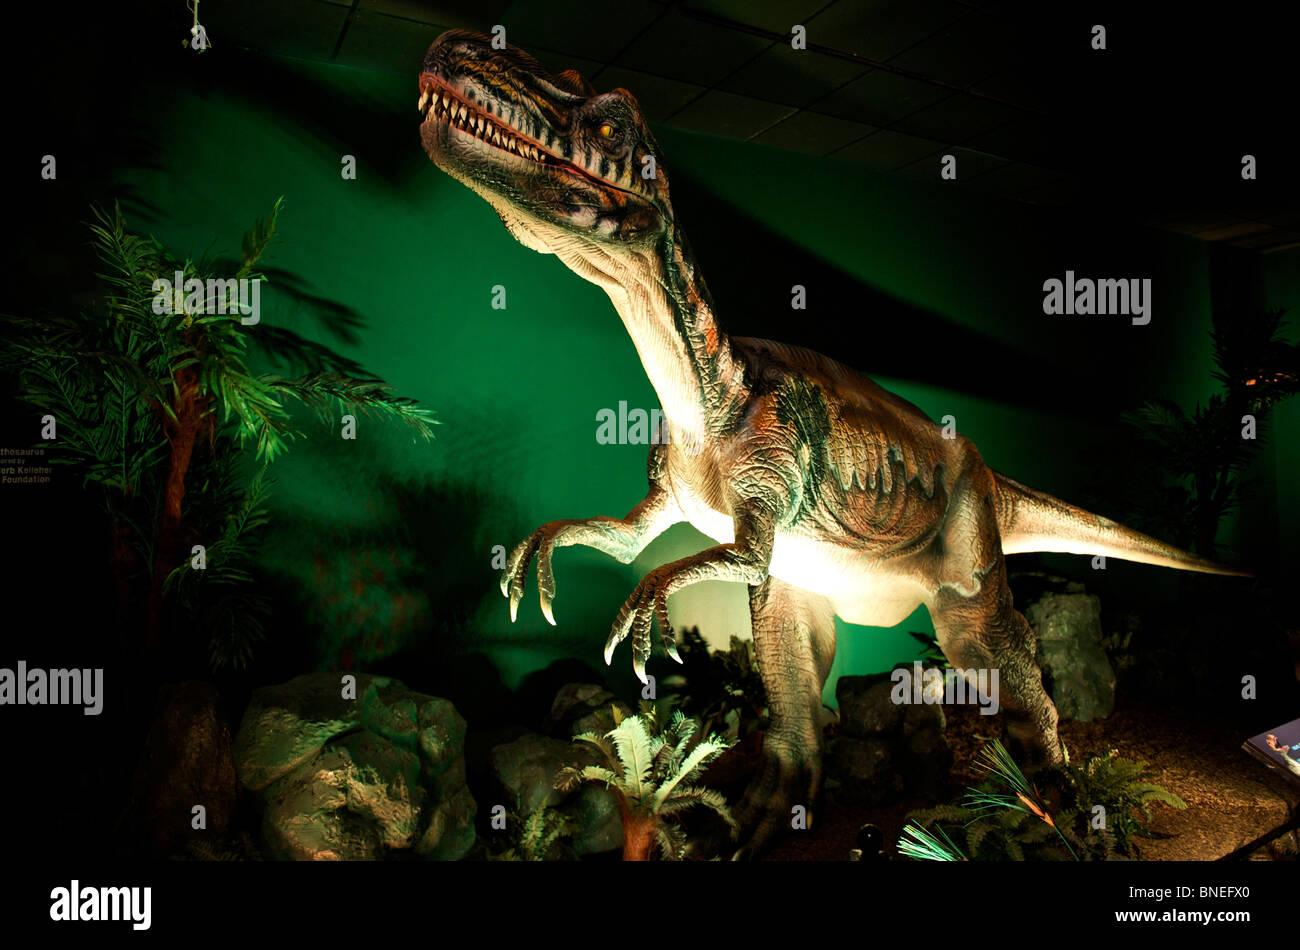 Sculpture of Velociraptor at Witte museum housing Dinosaur exhibition in Texas San Antonio, USA Stock Photo